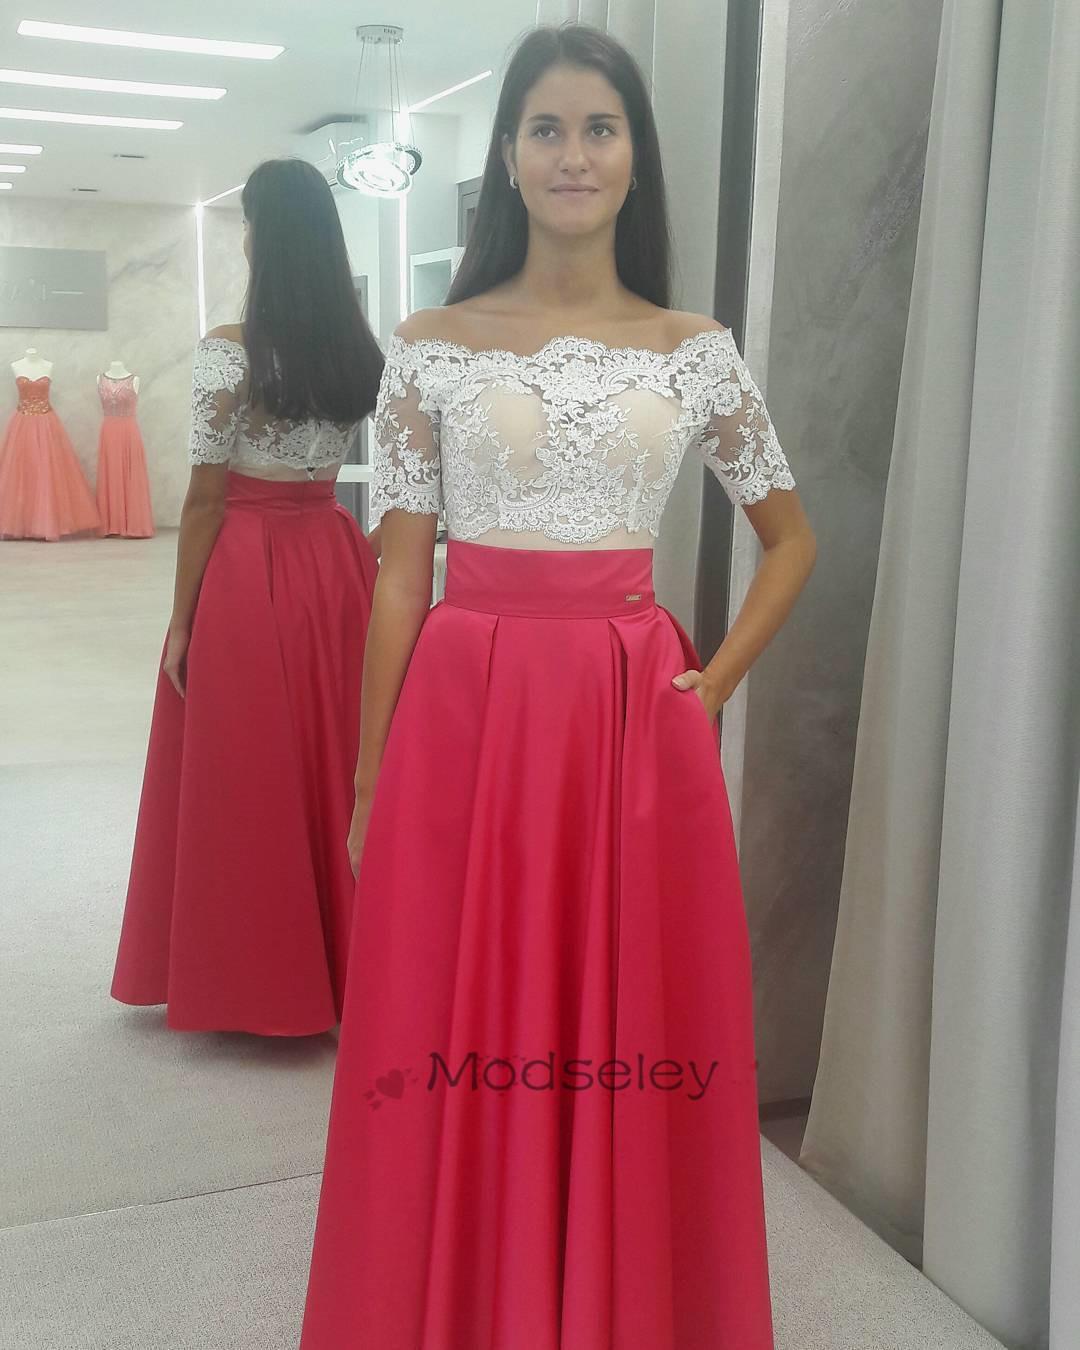 48e57dcab690 Elegant Off Shoulder Red Long Prom Dress White Lace Top ...